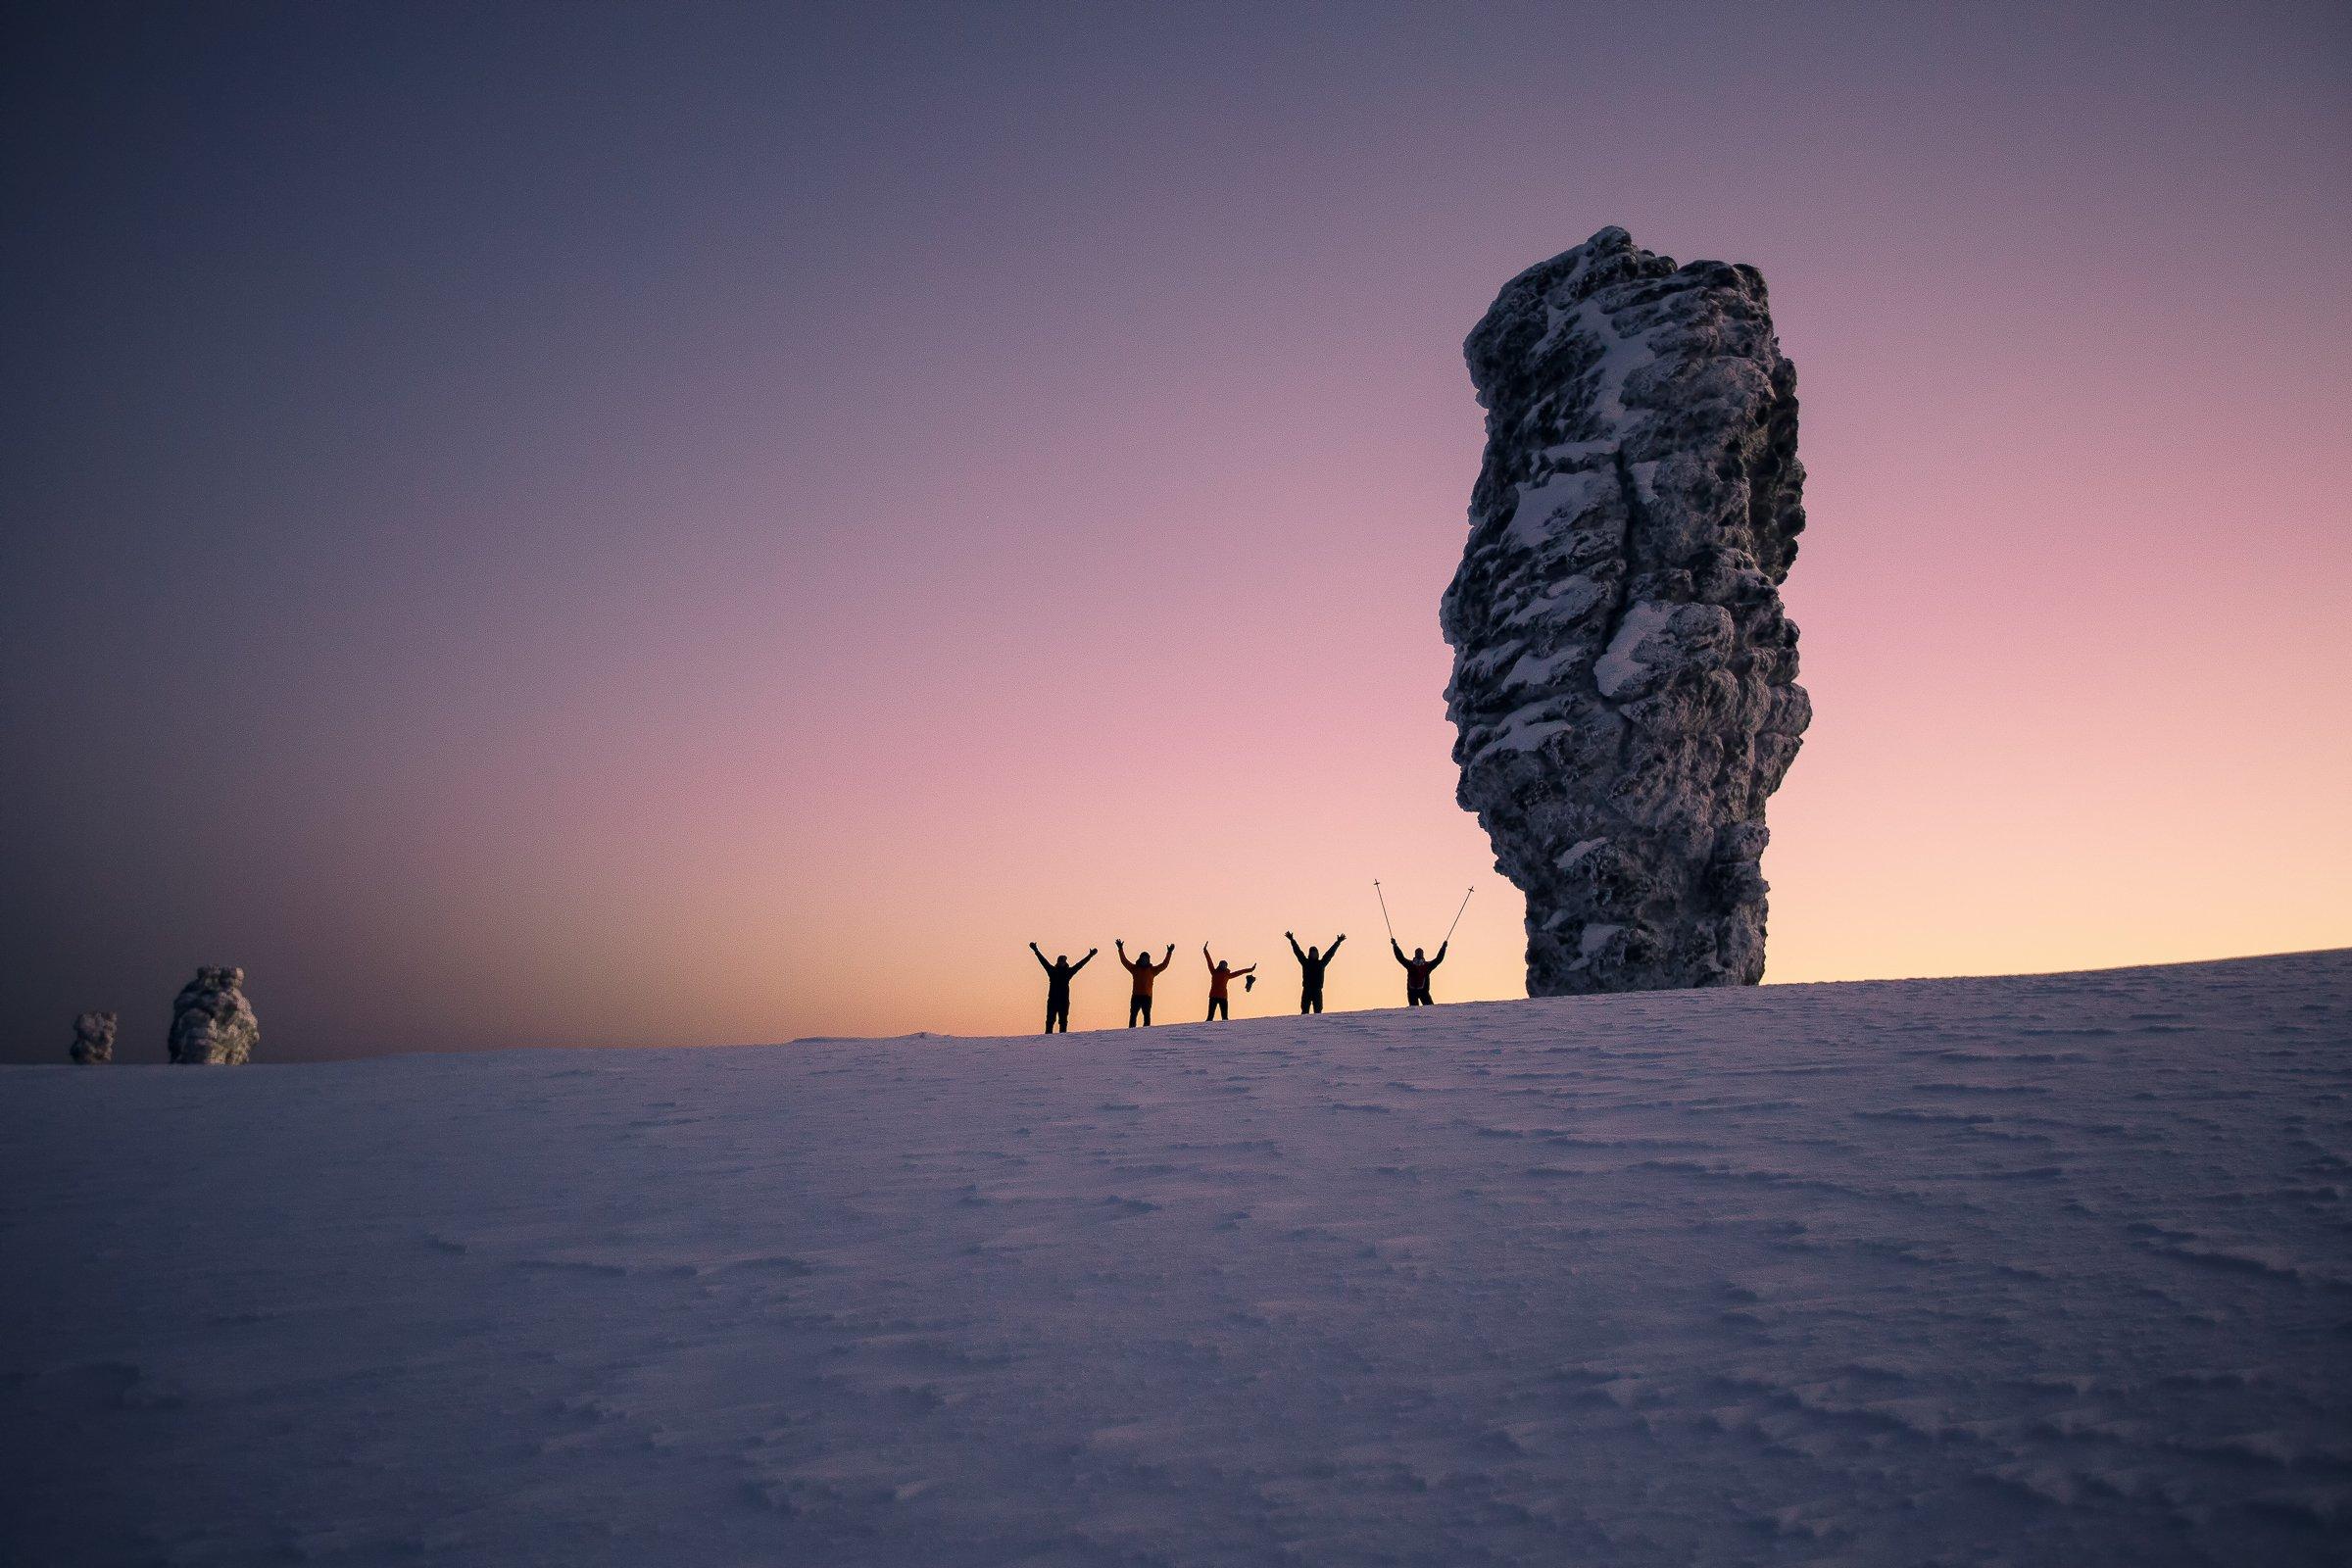 Маньпупунёр, Северный Урал, Коми, Урал, восход, люди, контуры, пейзаж, снег, зима, Владимир